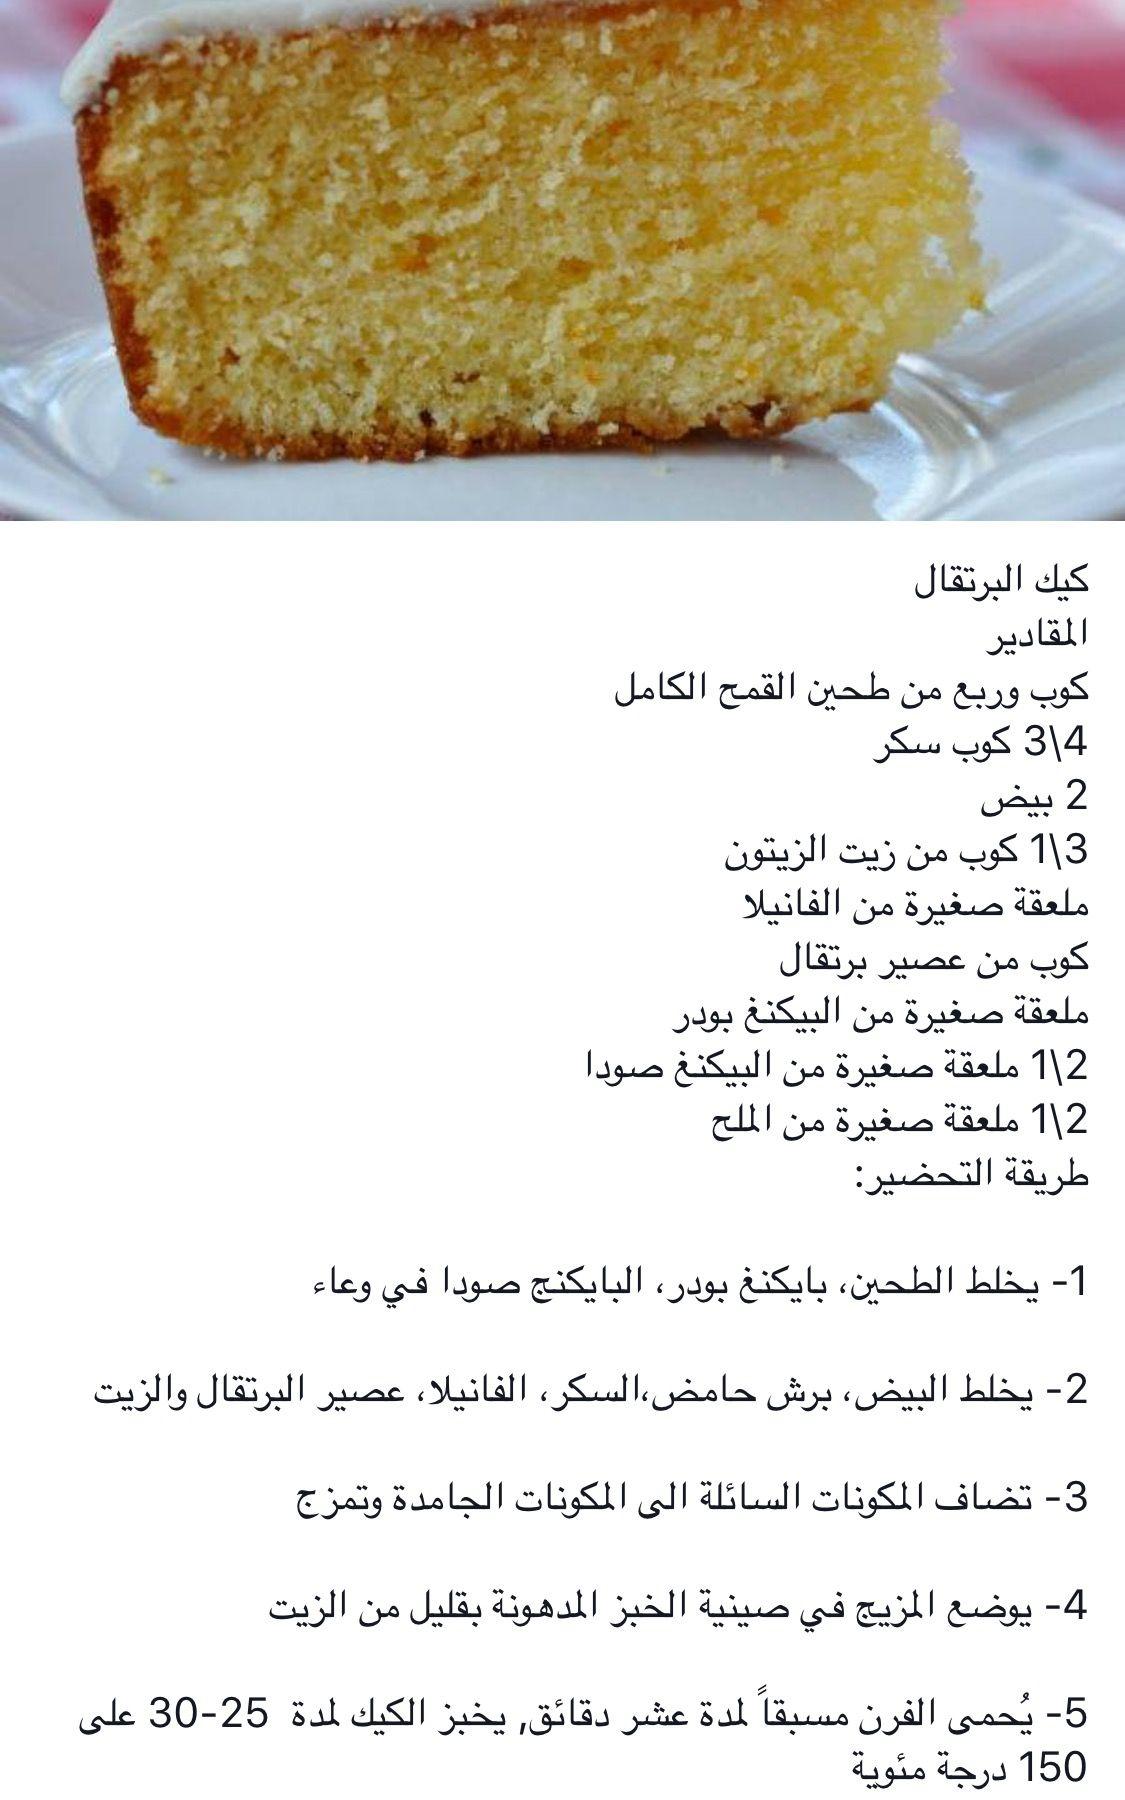 كيك البرتقال Arabic Food Food Recipies Tunnocks Tea Cakes